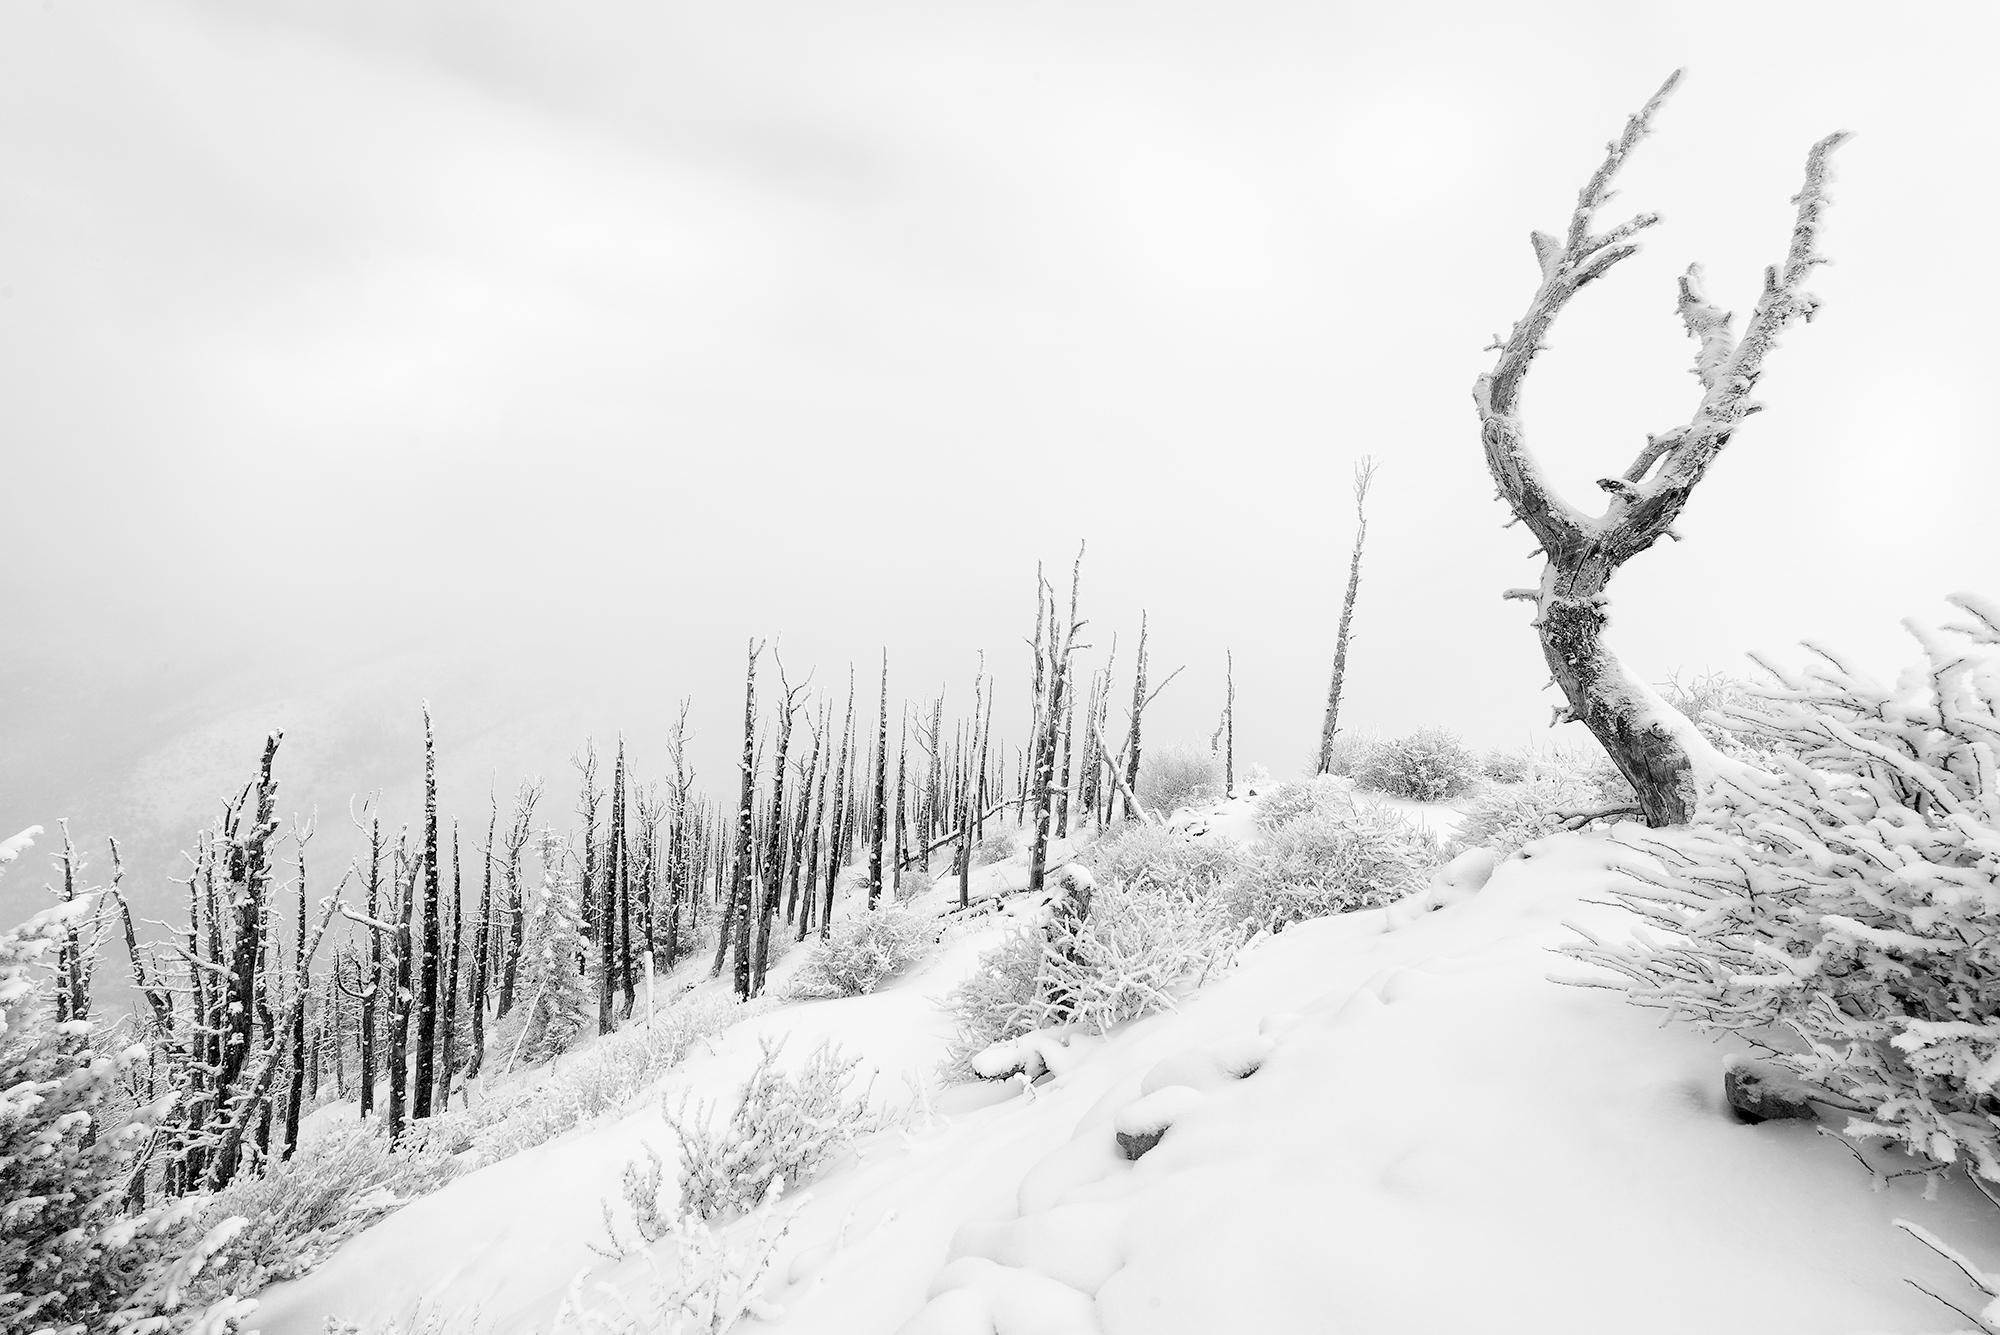 The Burn. Sugarloaf Mountain, Colorado, 2015